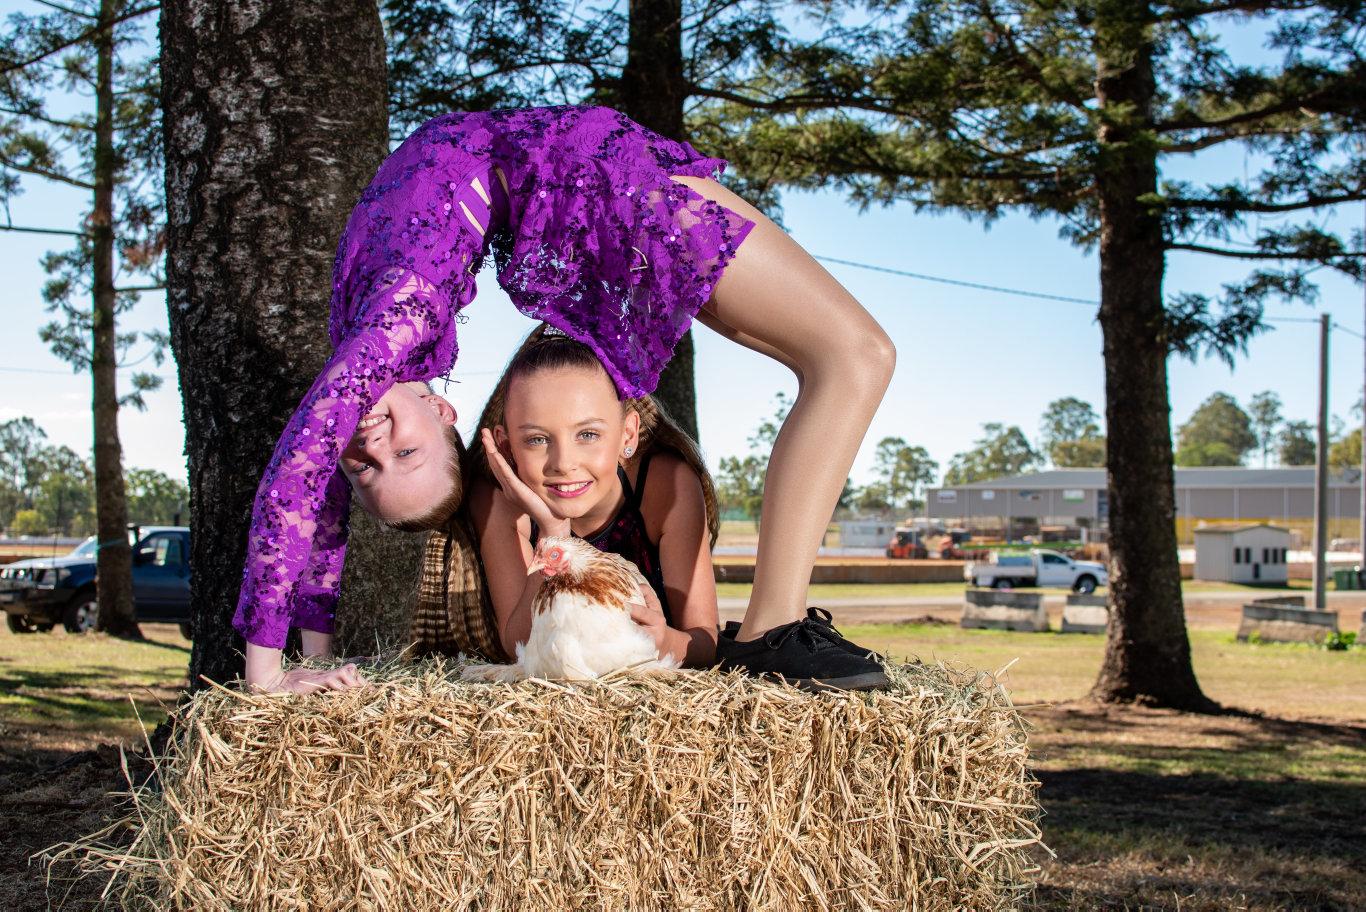 Starlite dancers Makenna Wakley, 10, of Mount Whitestone, holds her Salmon Peakin chicken Sally Salmon, with Hayley Shearer, 12, of Buaraba.